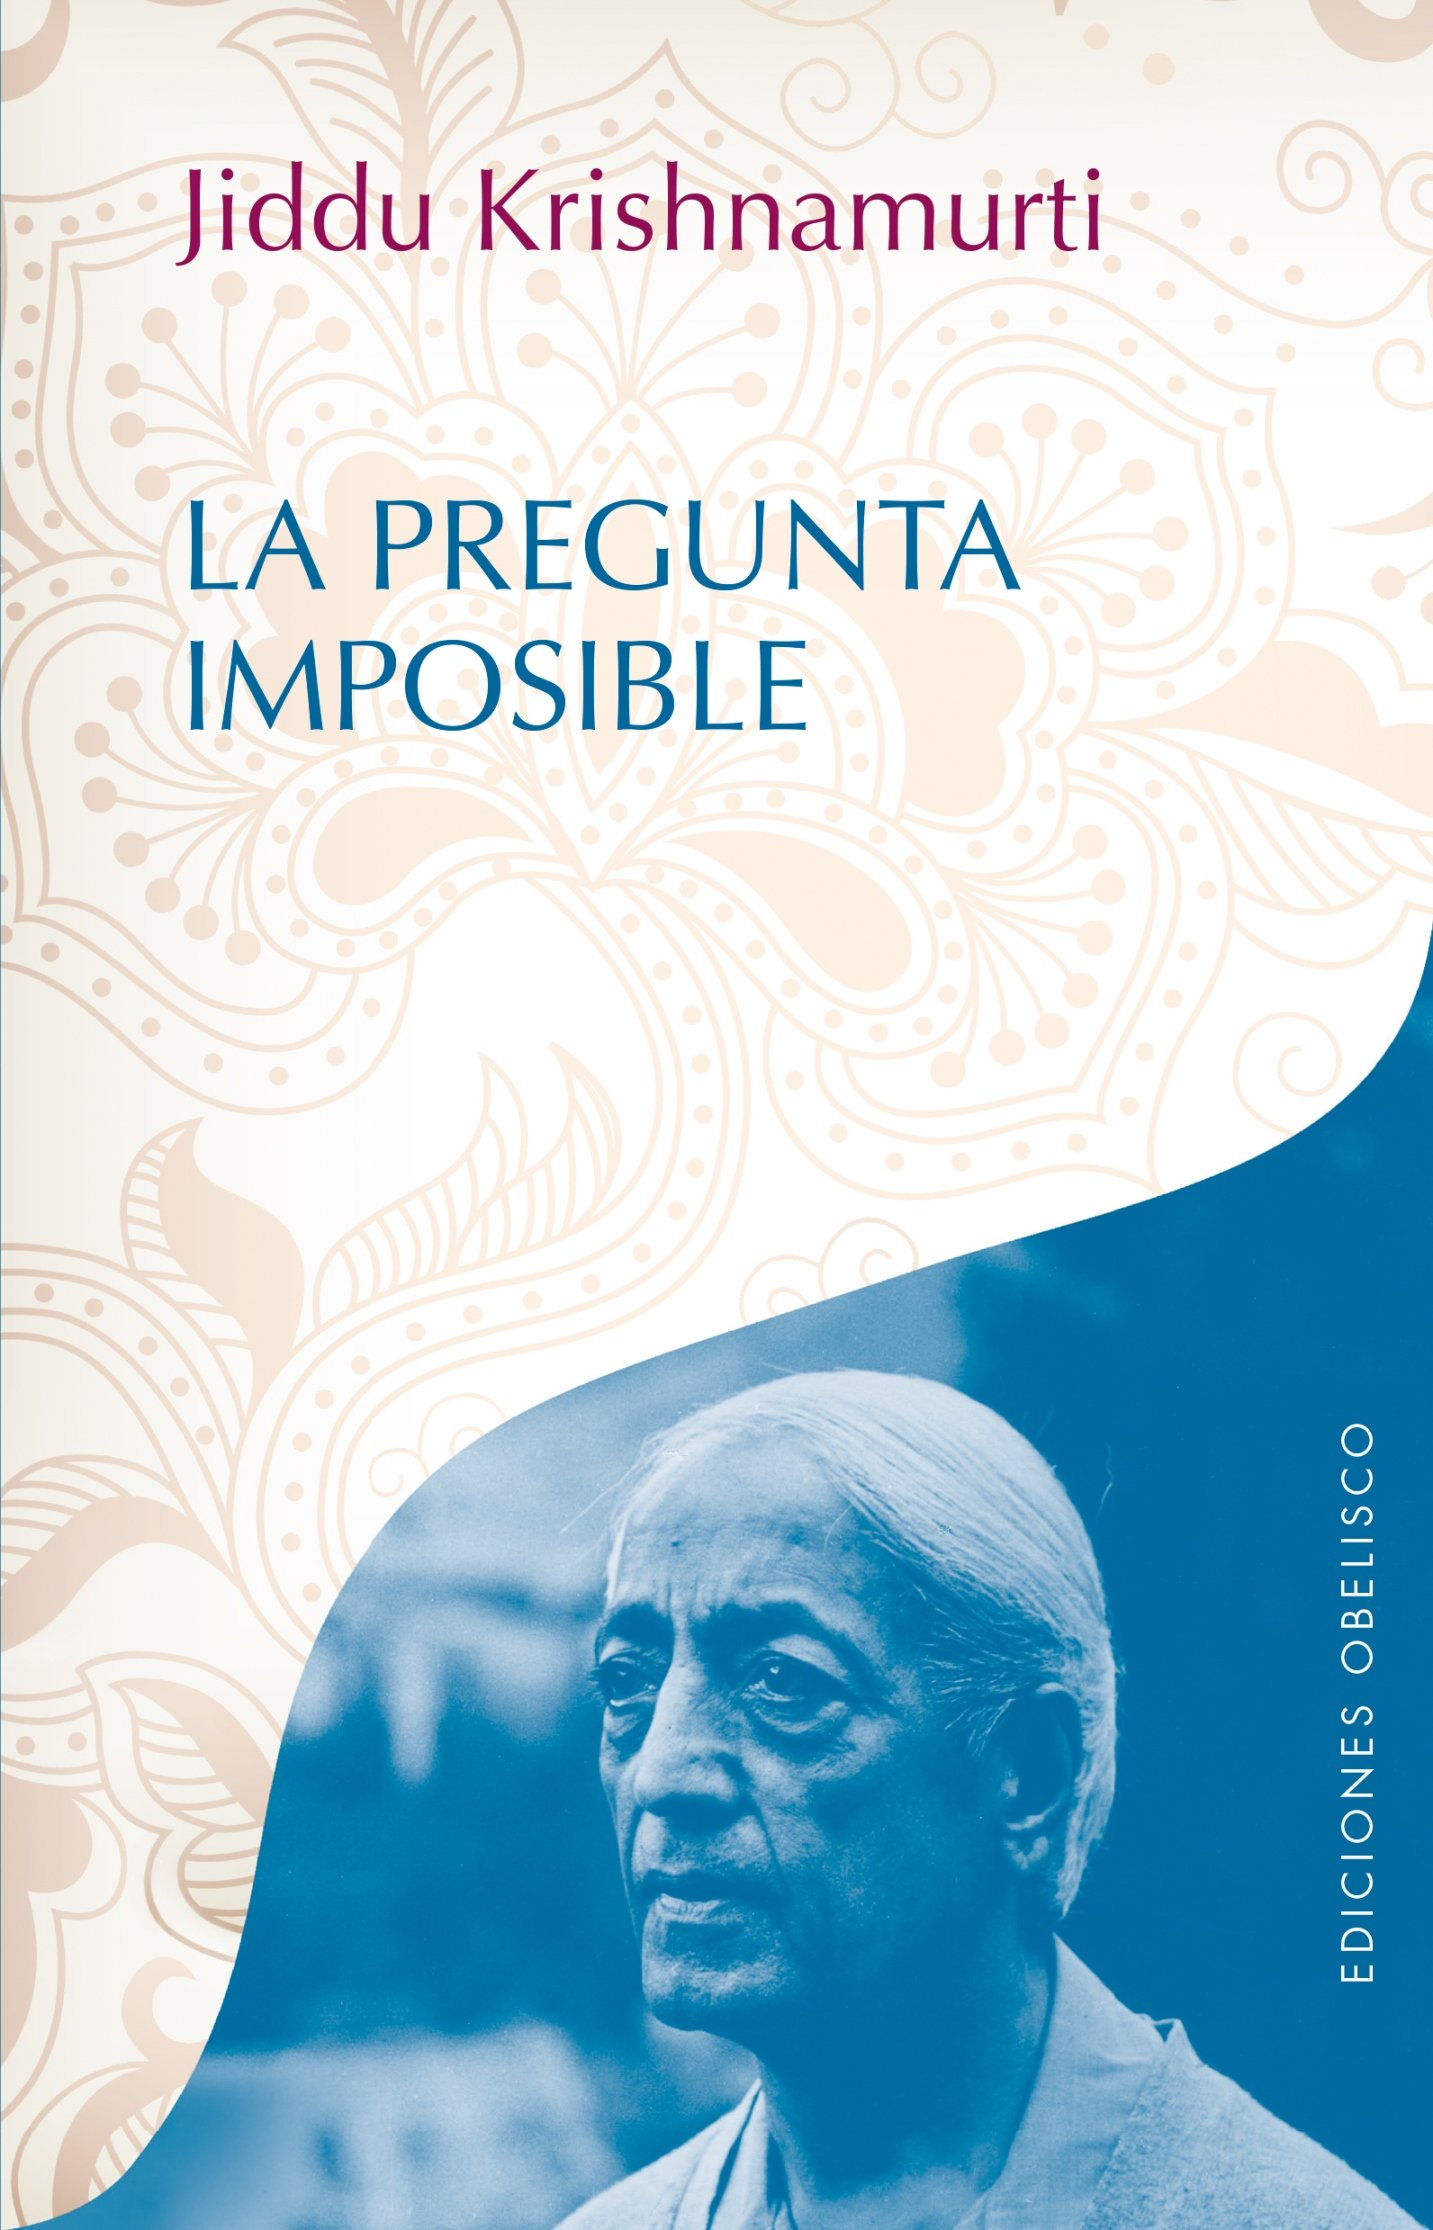 La pregunta imposible (Spanish Edition) PDF